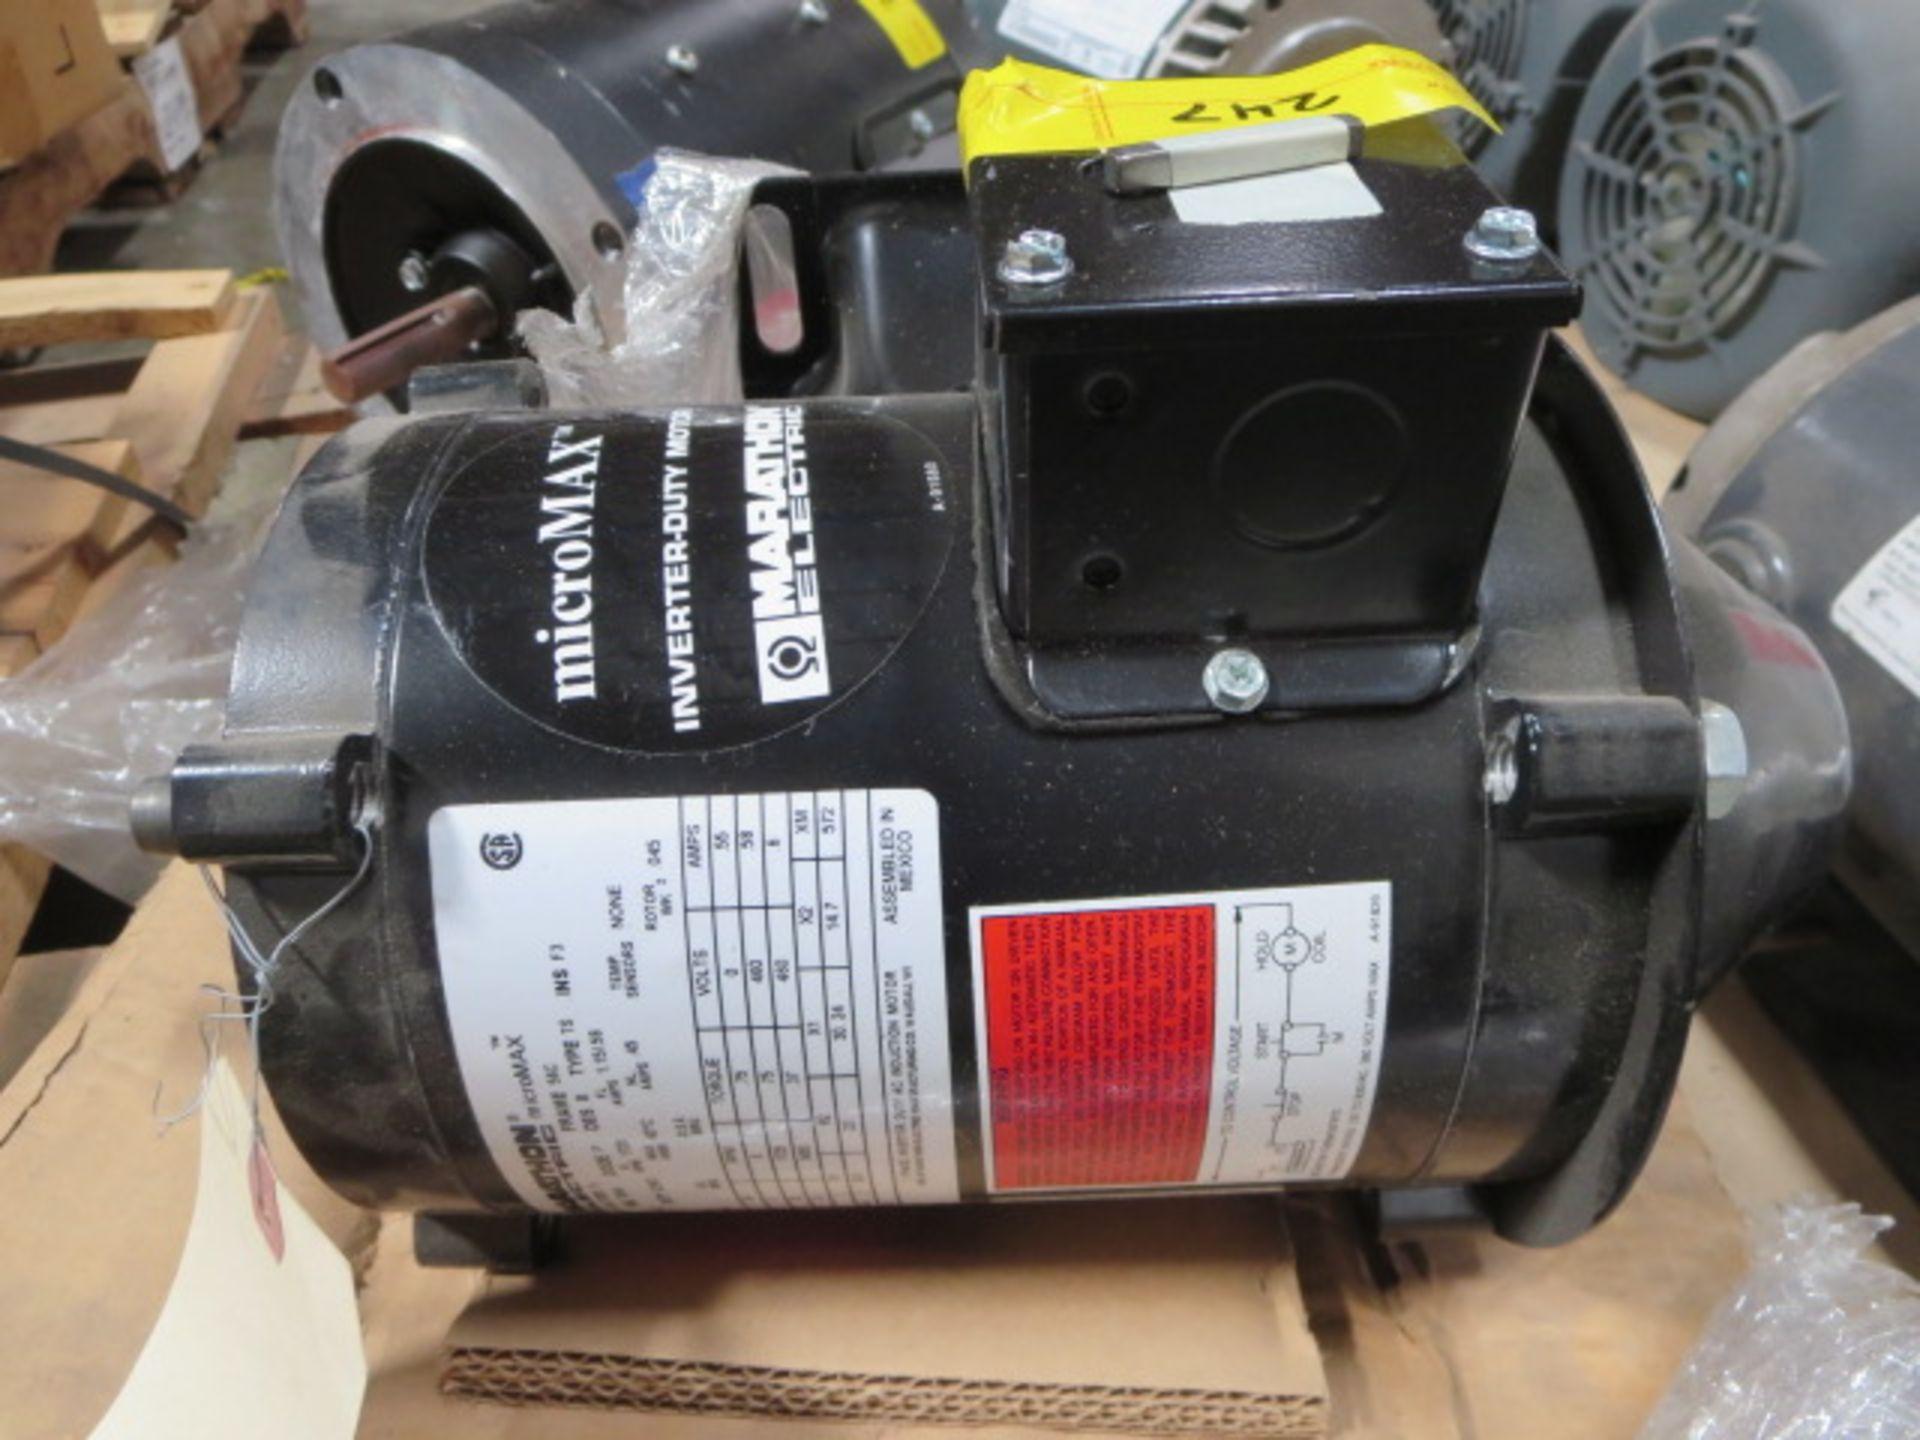 Lot 247 - Marathon Micro Max Inverter Duty Motor, 3 Phase, 120Hz, model FVN 56H17T2001 K